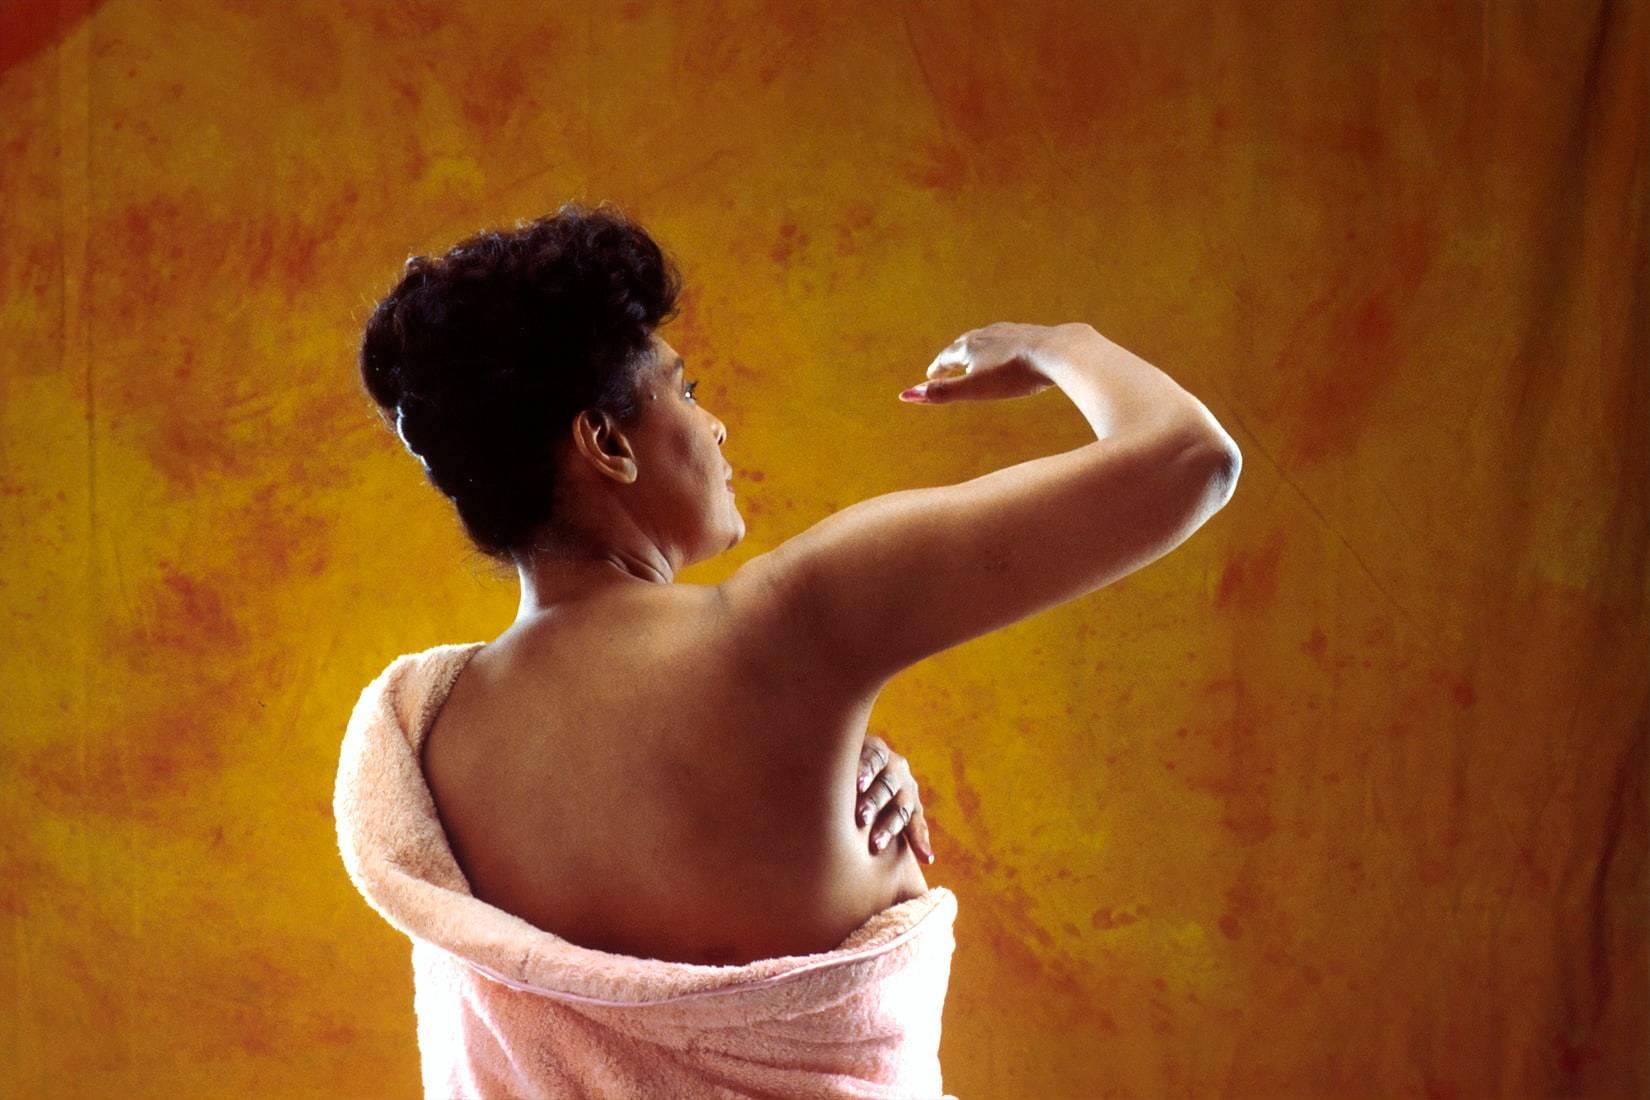 Woman Doing Breast Self Exam | Goodwill Car Donations